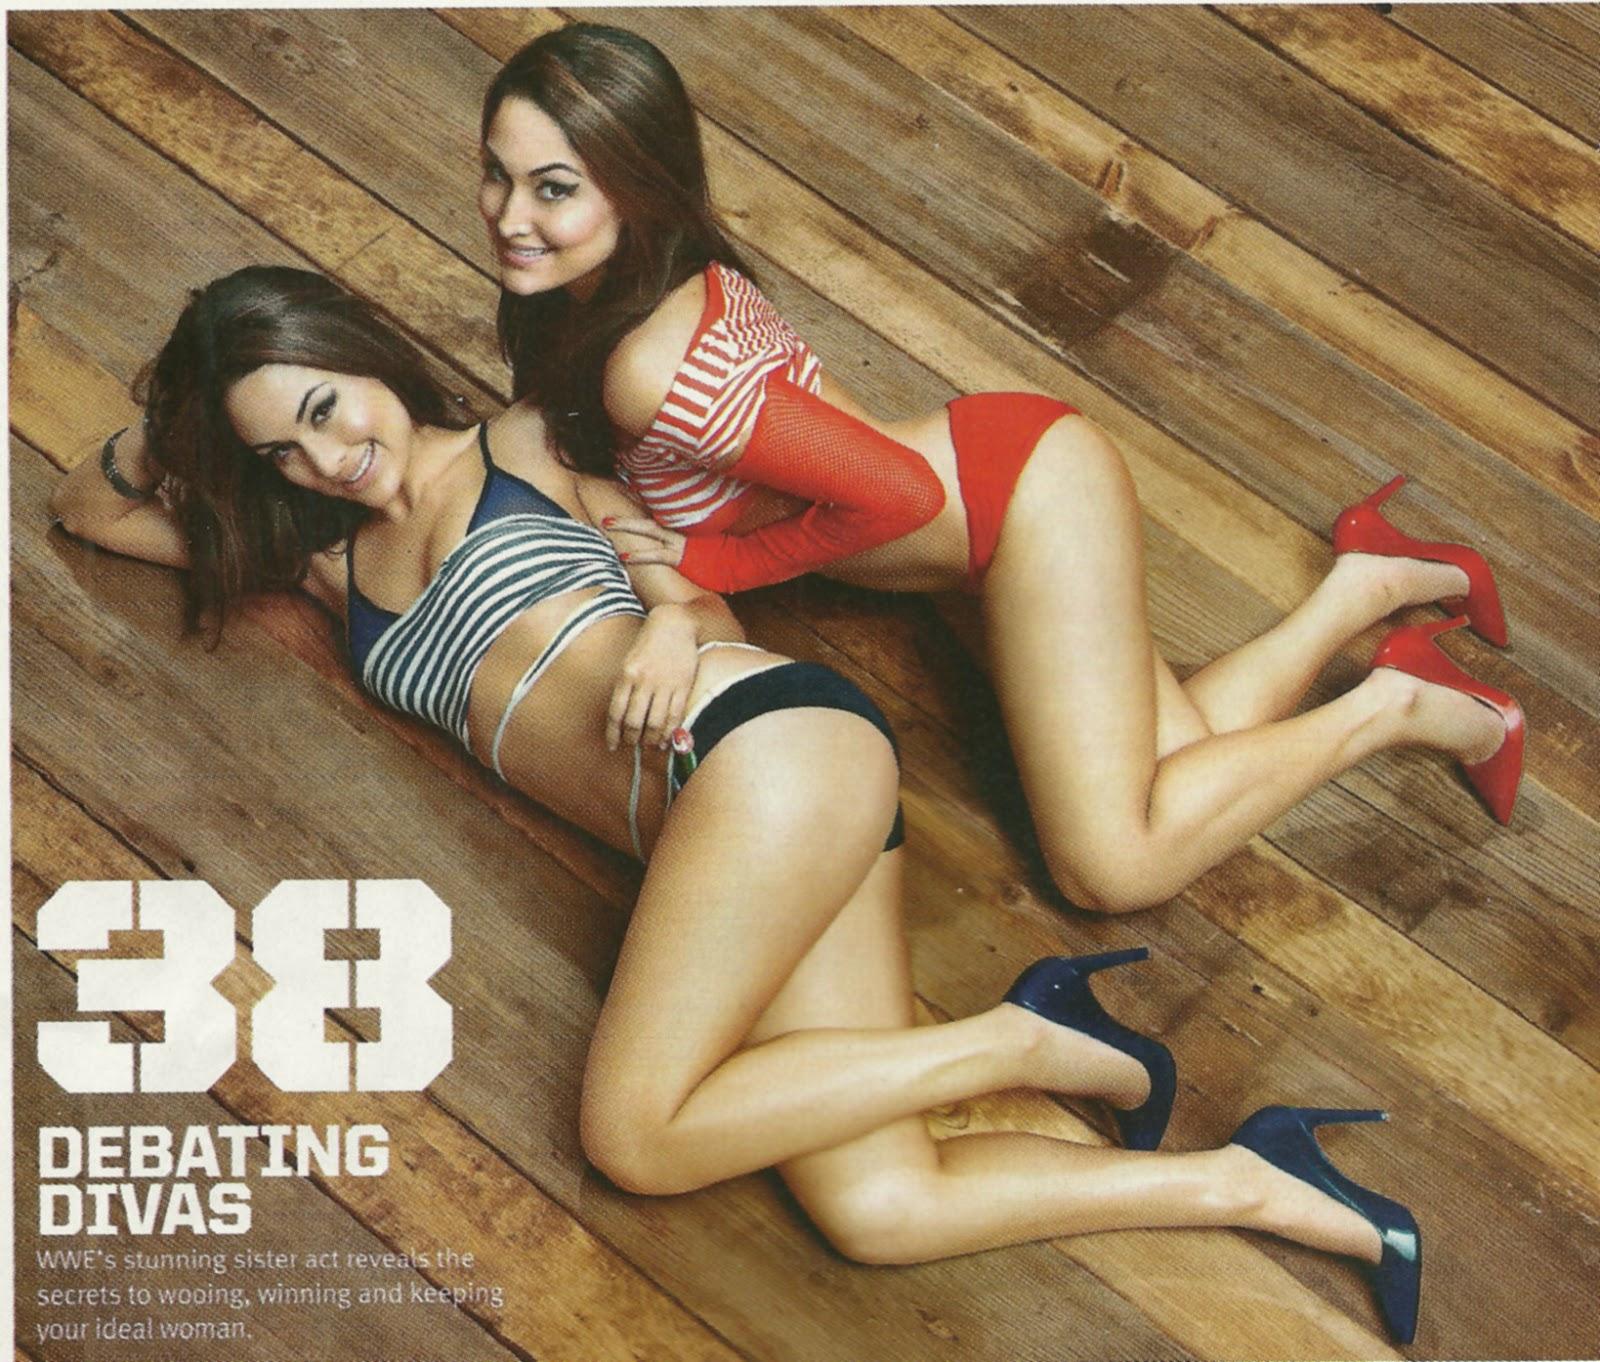 bella naked twins wwe Nude